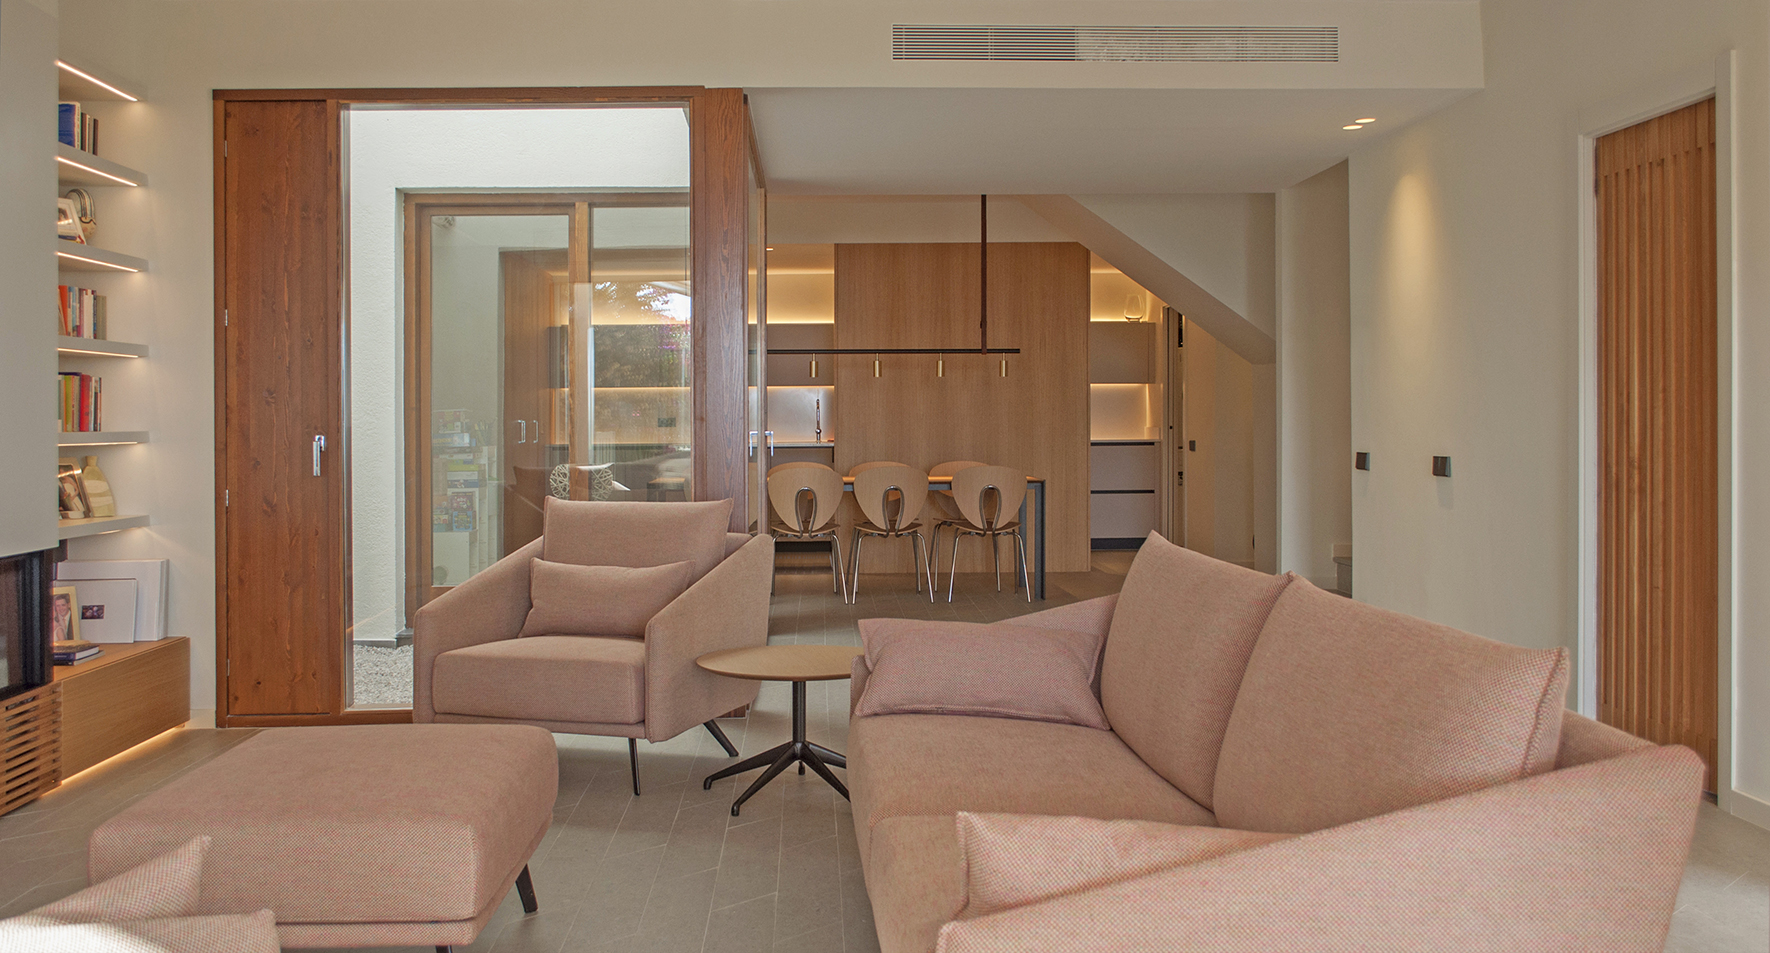 3-arquitectura-sitges-interiorismo-barcelona-salon-comedor-moderno-costura-globus-madera-cocina-patio